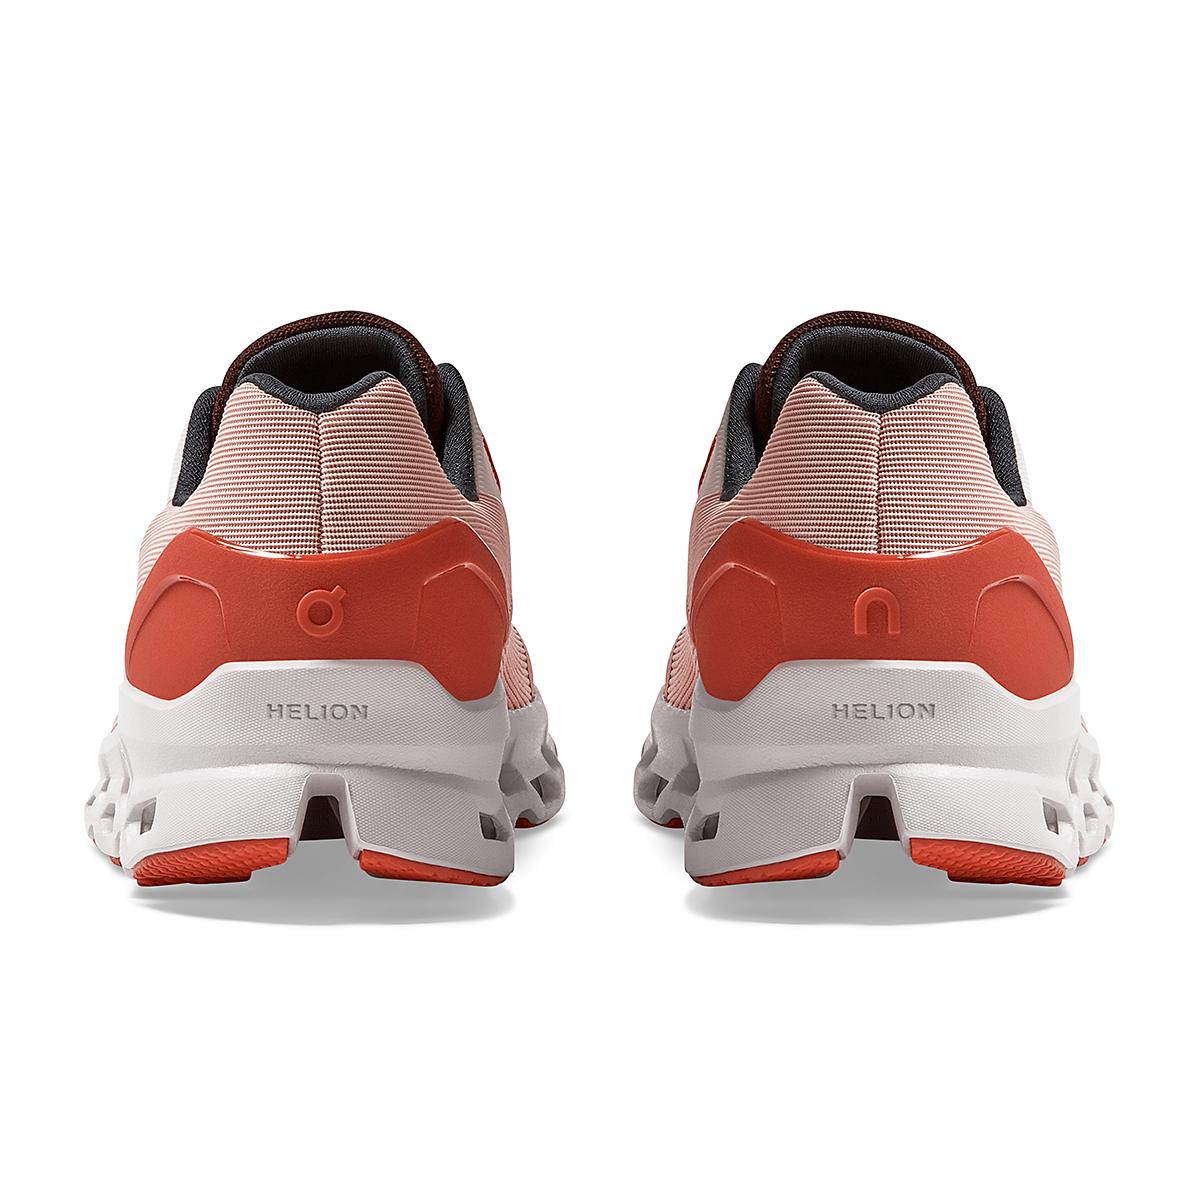 Women's On Cloudstratus 2.0 Running Shoe - Color: Rose/Red - Size: 5 - Width: Regular, Rose/Red, large, image 5